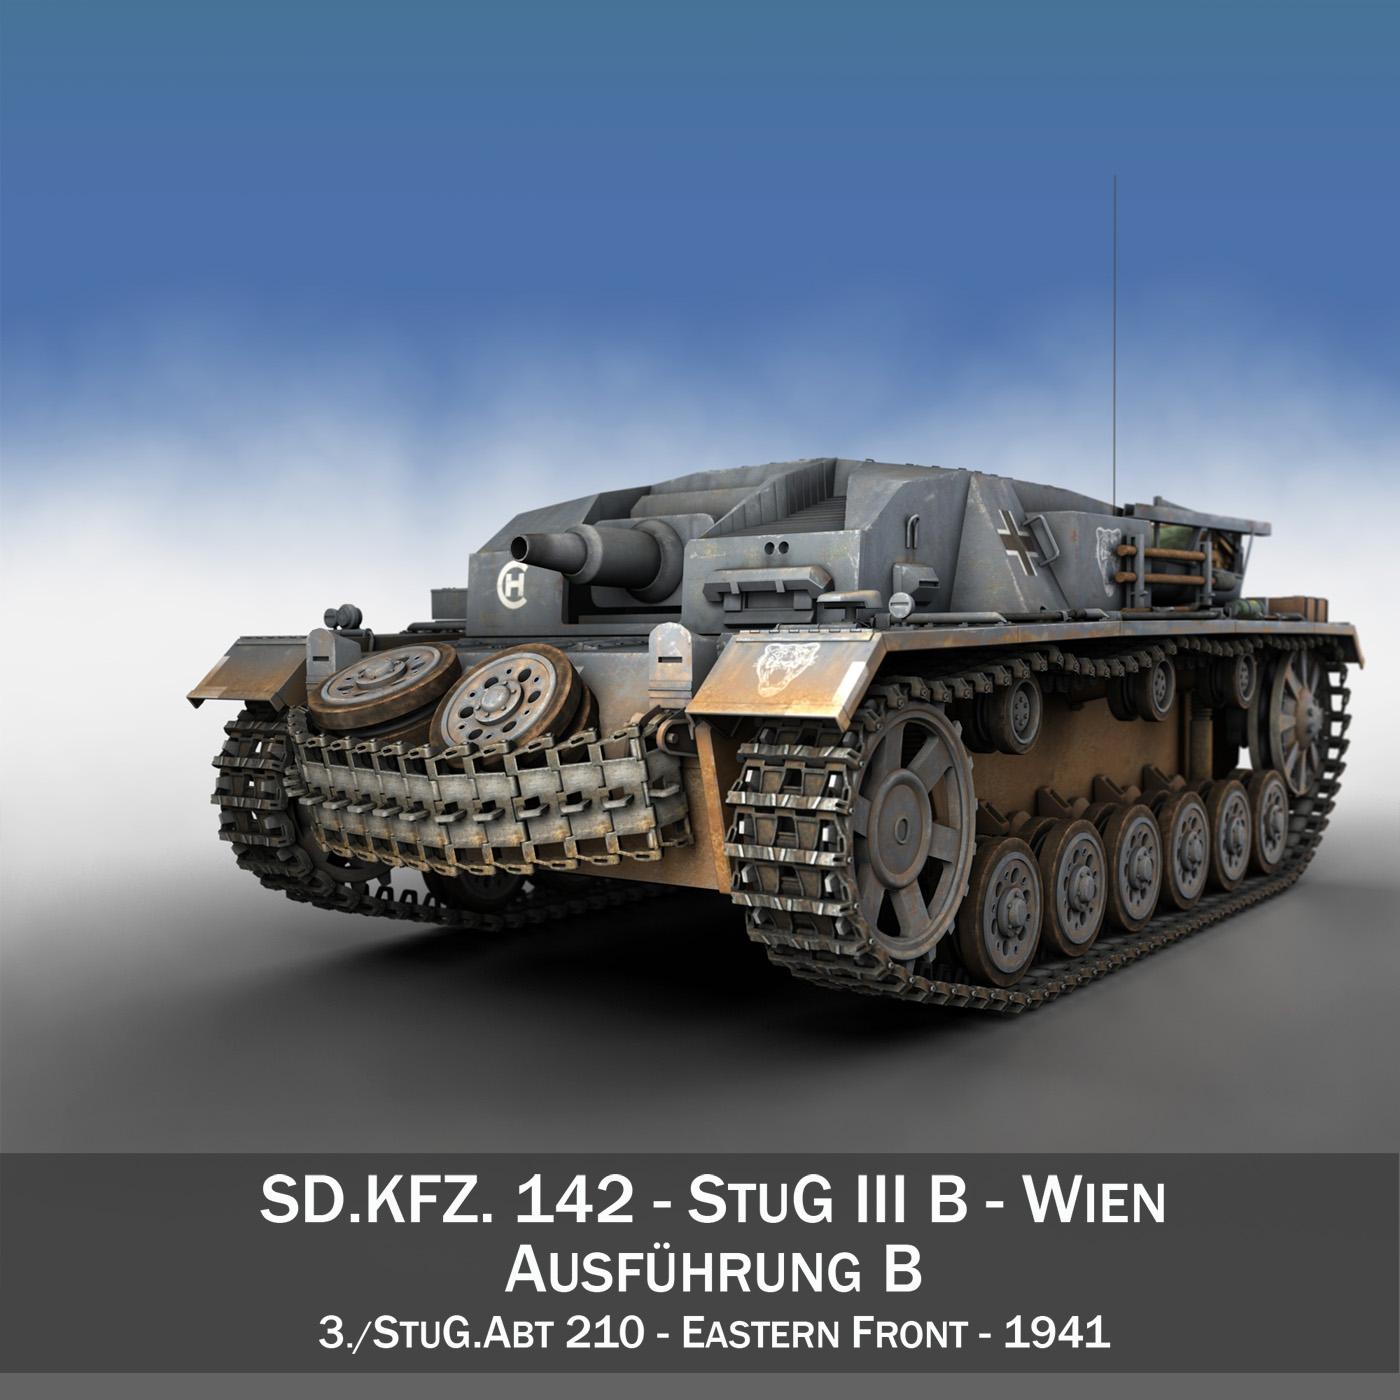 stug iii – ausf.b – wien 3d model 3ds fbx lwo lw lws obj c4d 265838